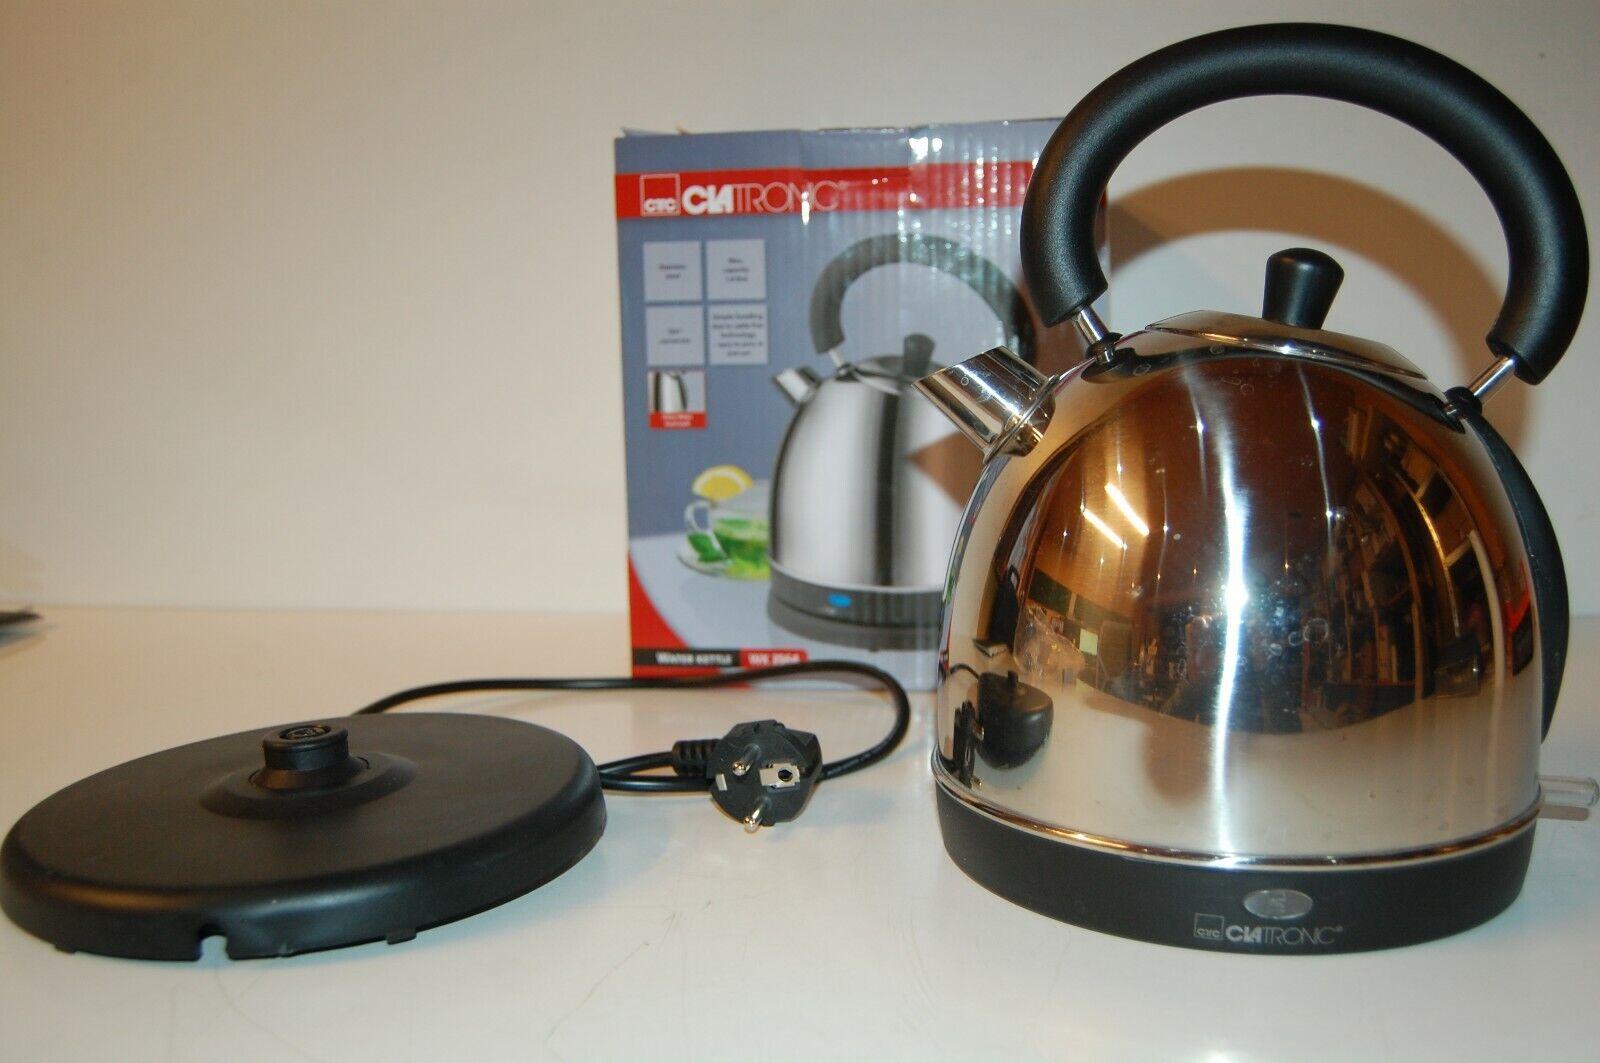 CLATRONIC Wasserkessel WK 3564 inox 1,8L 1800W Wasserkocher Teekocher kabellos